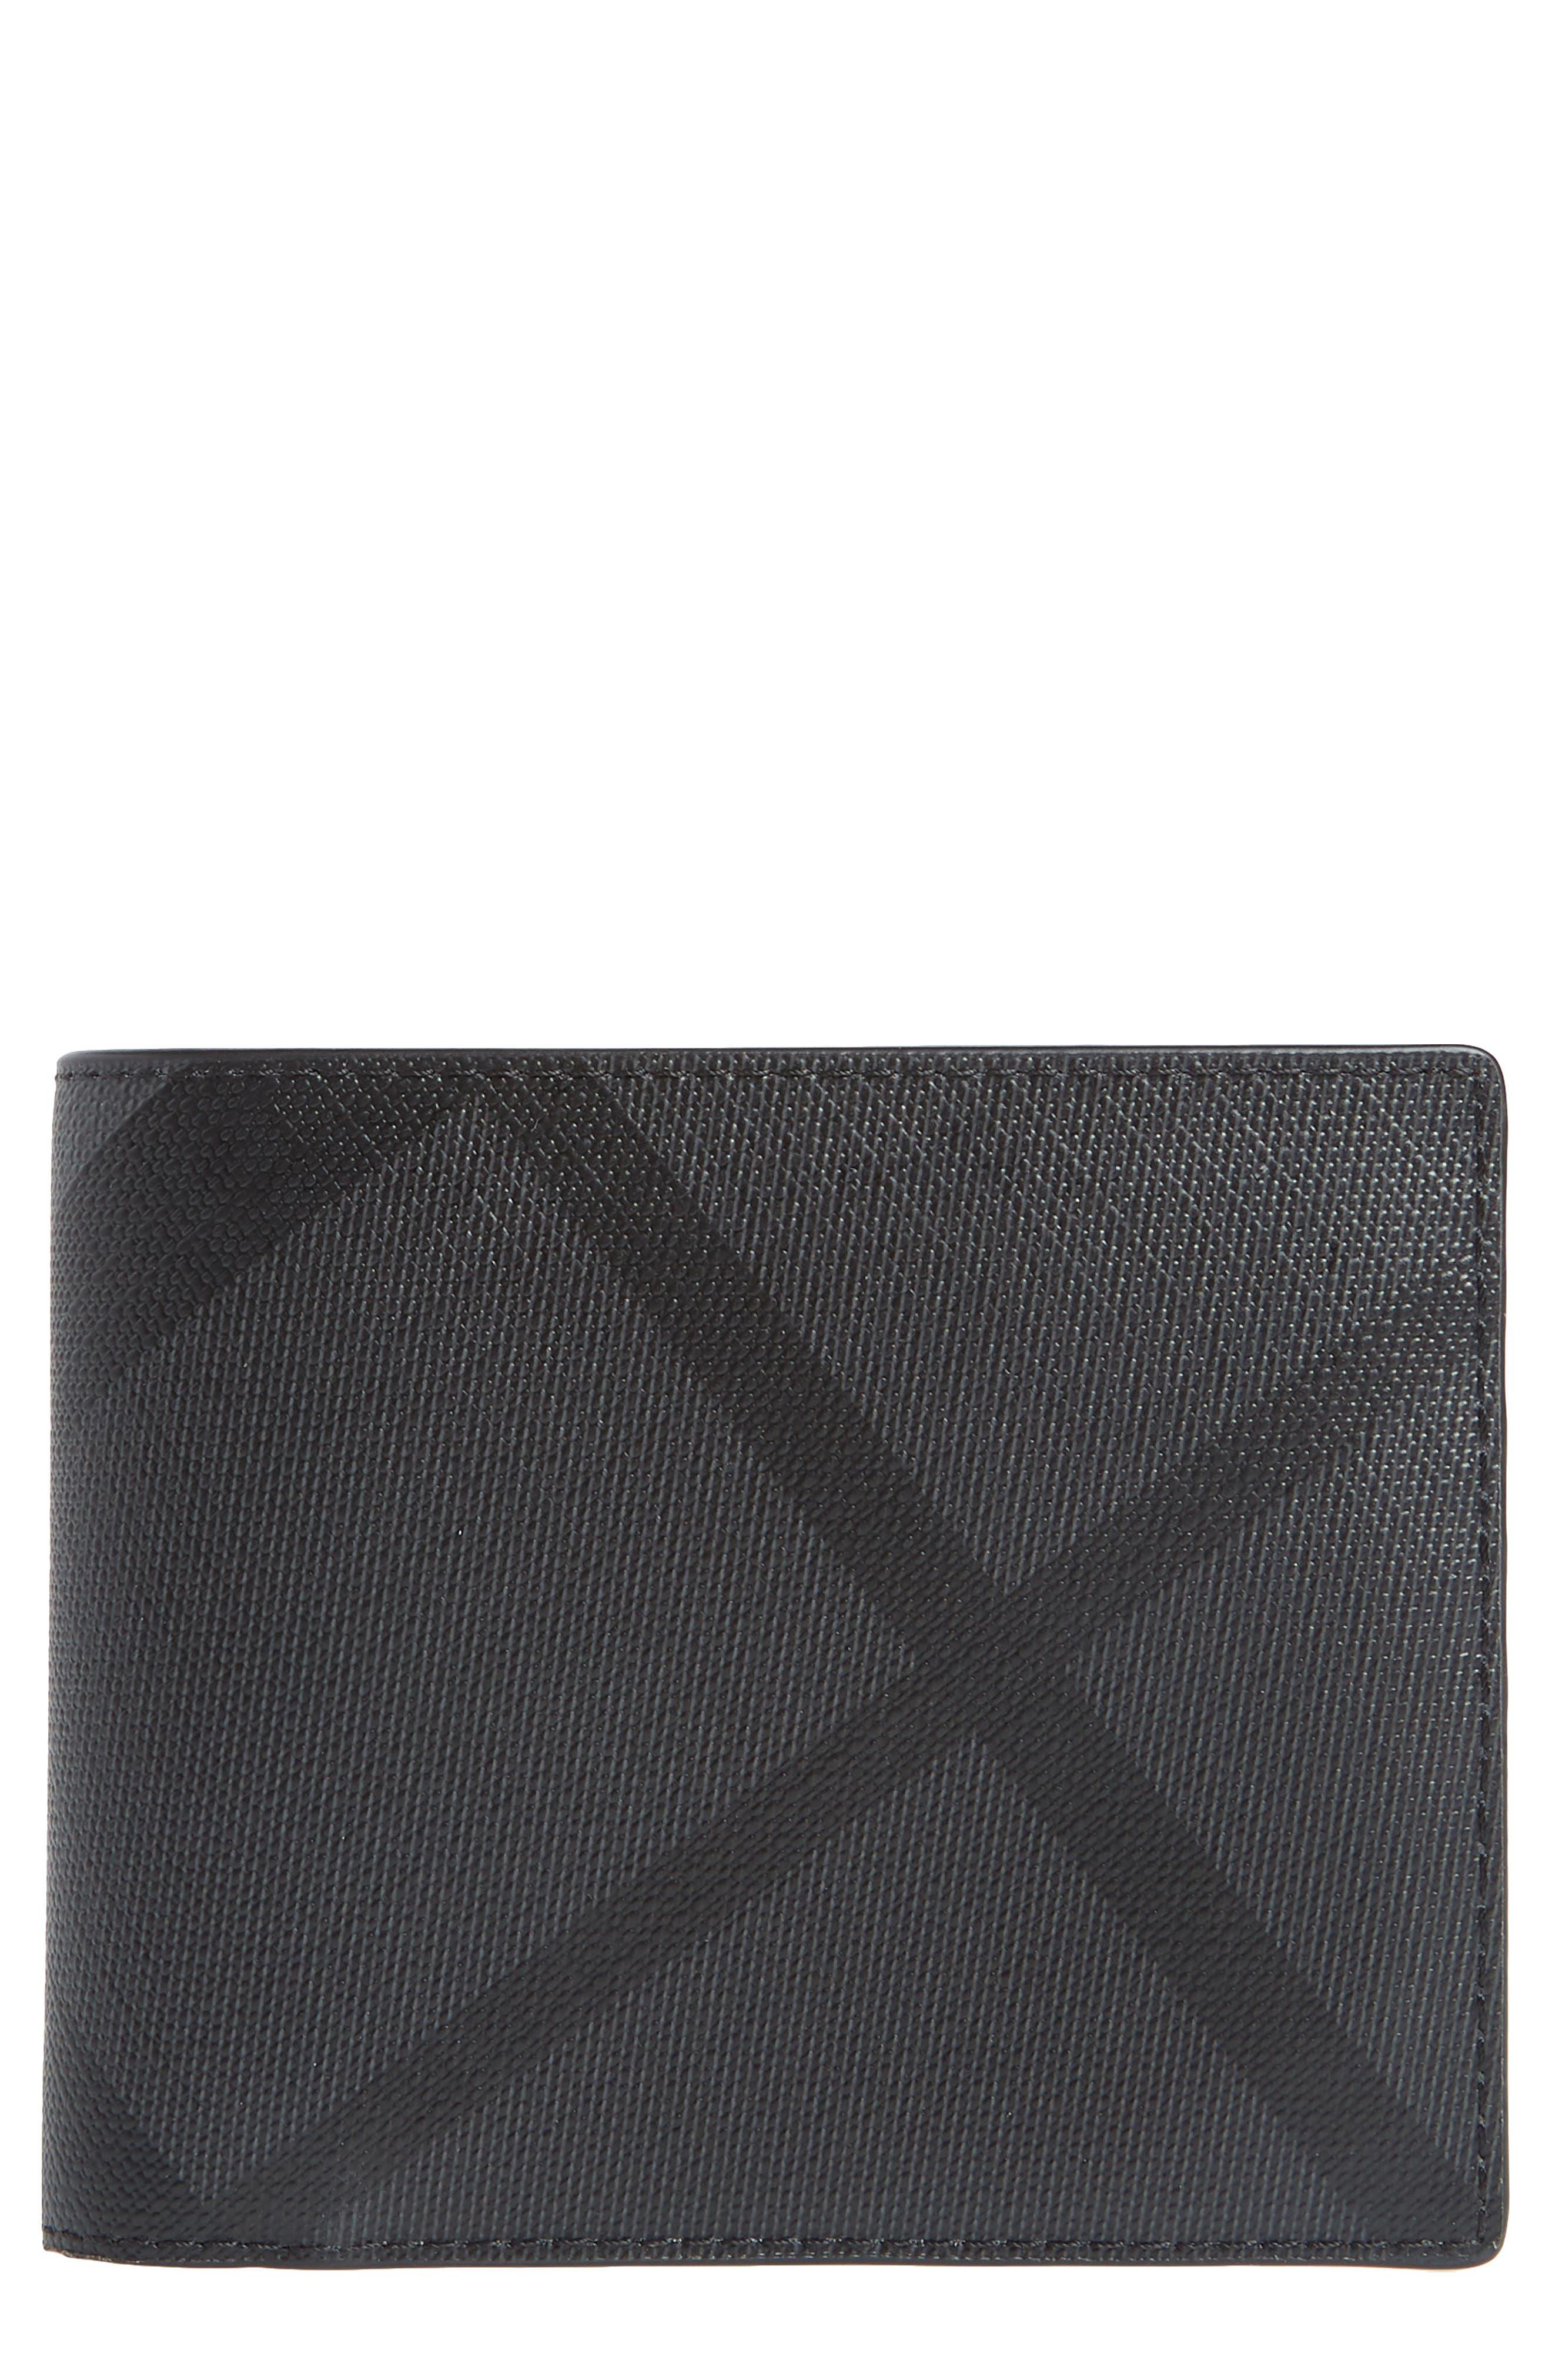 Ronan Check Billfold Wallet,                         Main,                         color, 020